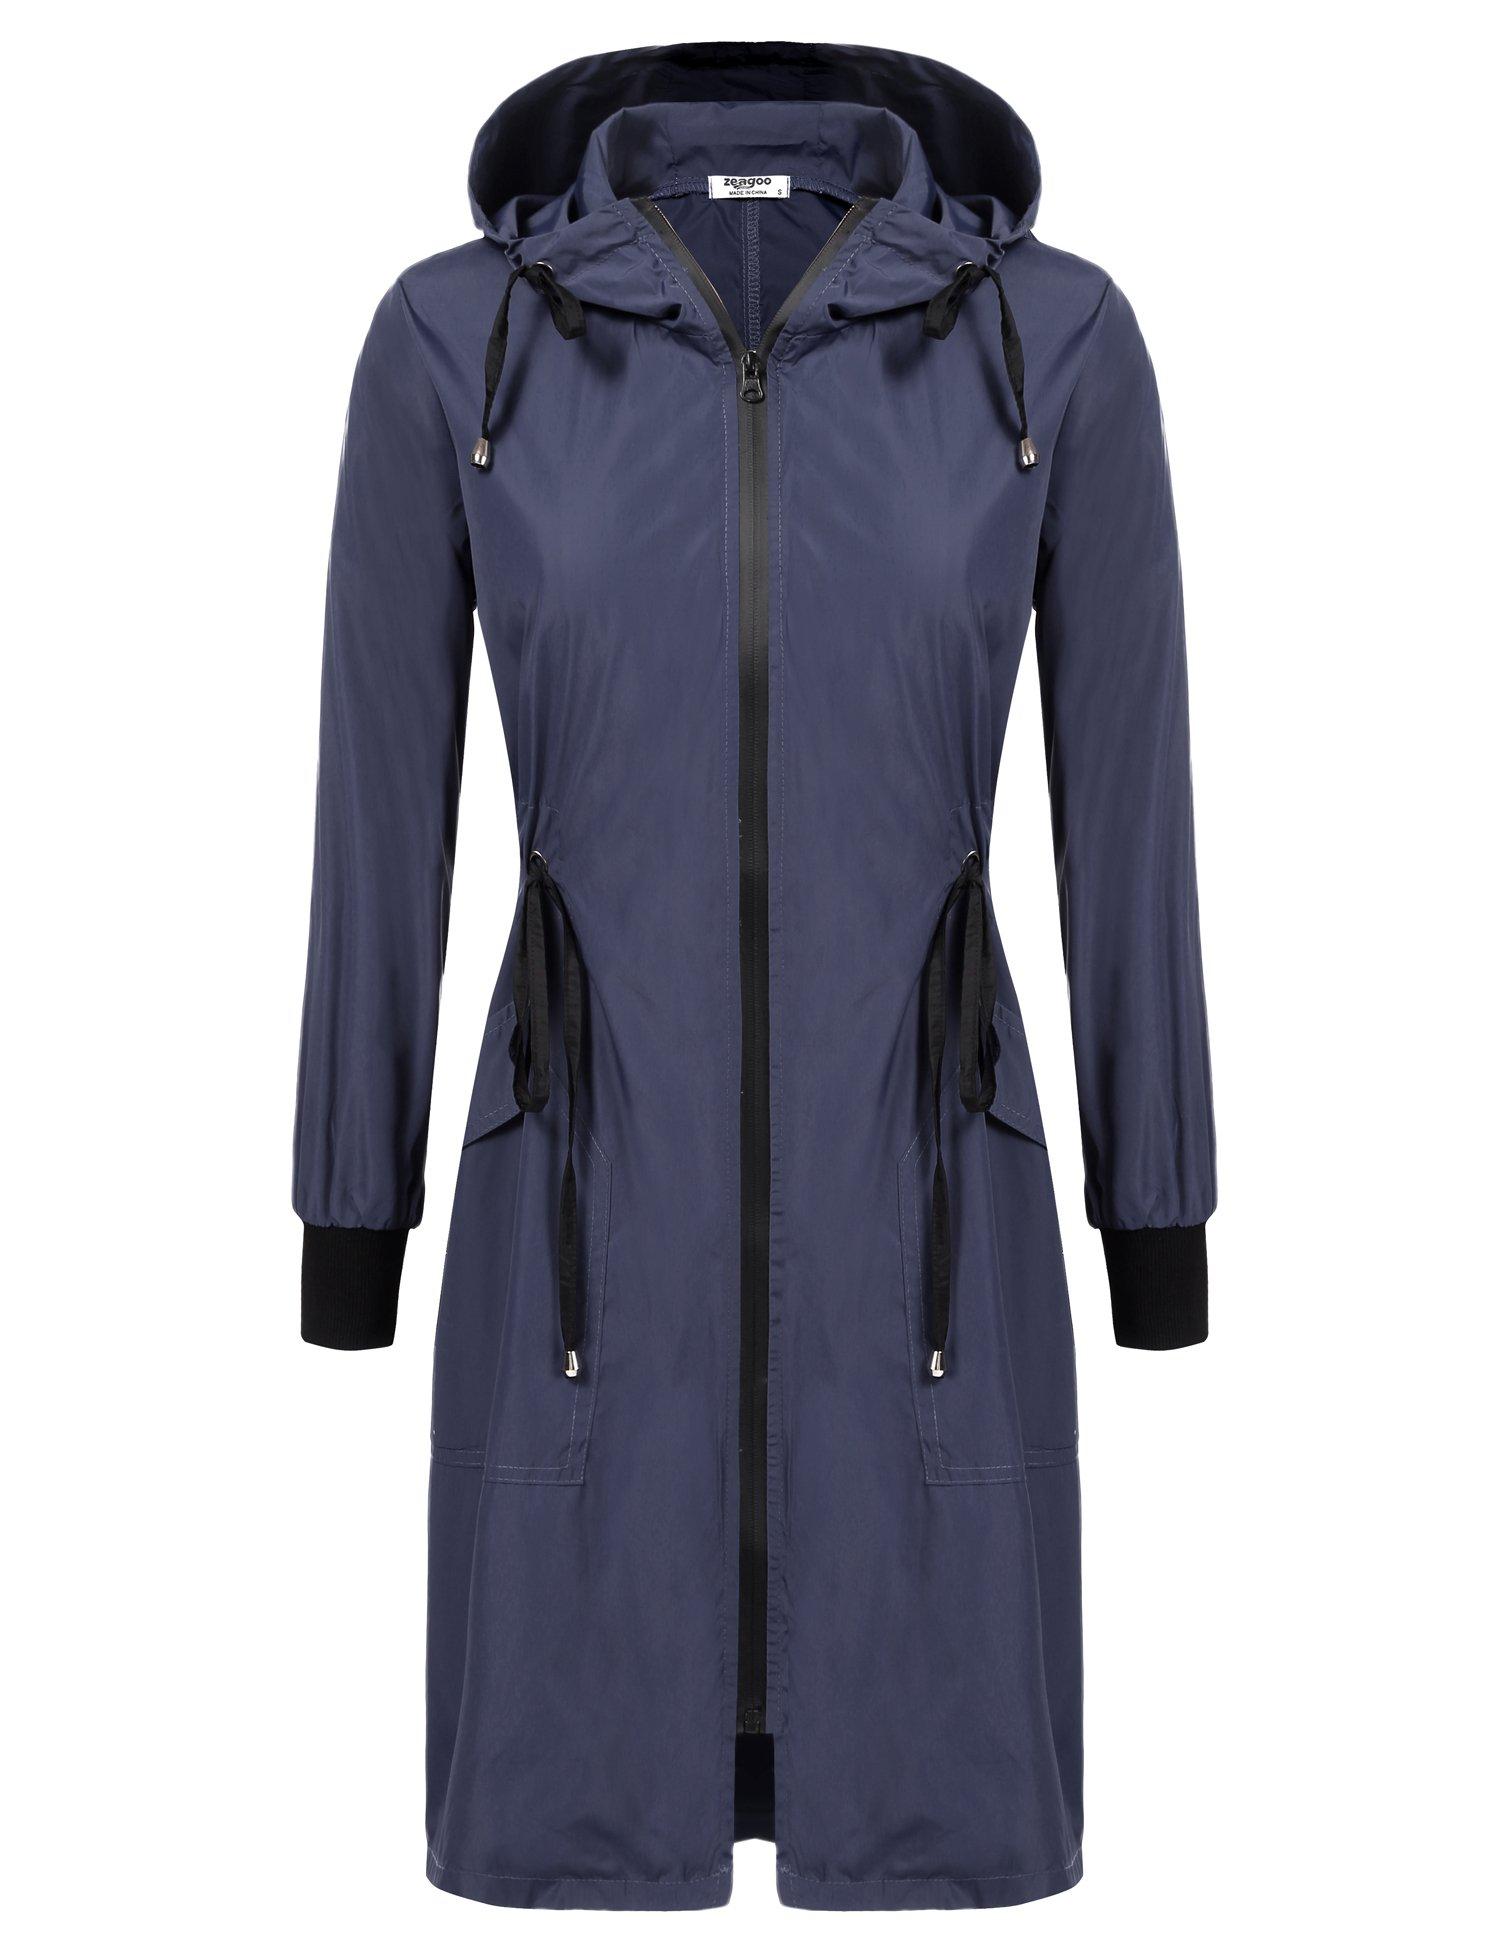 ELESOL Women's Waterproof Lightweight Hooded Drawstring Outdoor Raincoat Jacket,Navy Blue,L